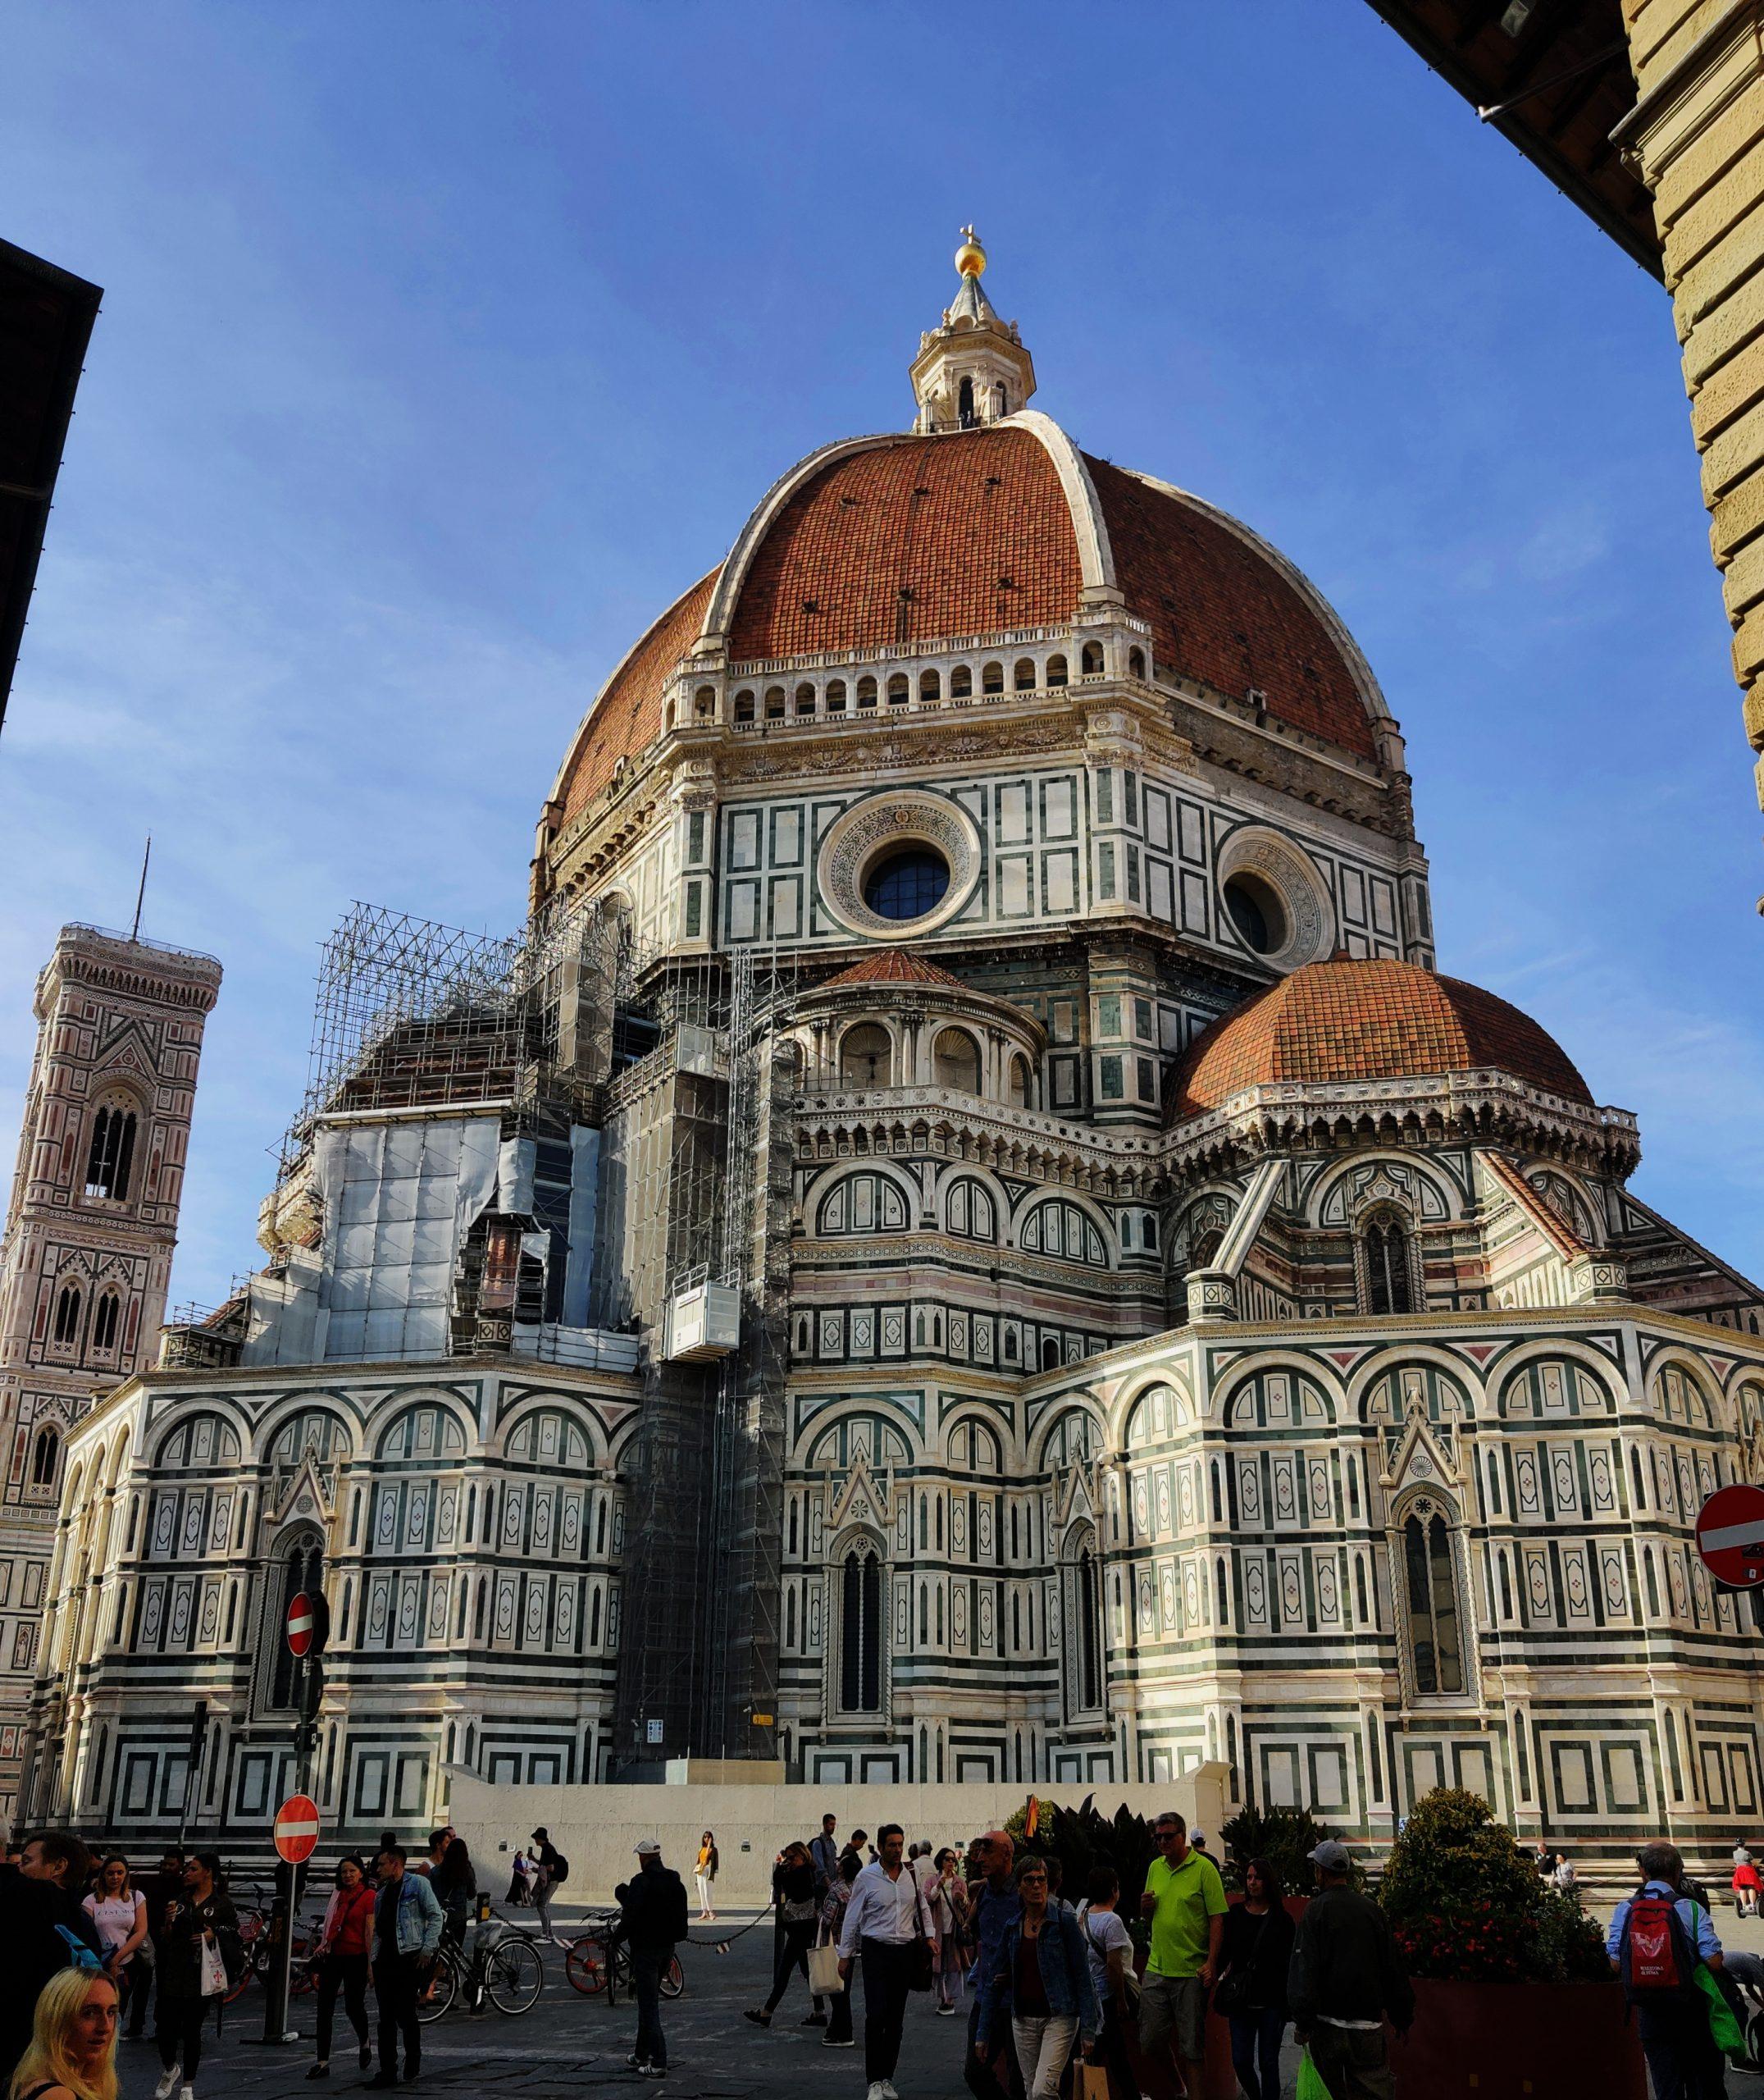 Cathedral of Santa Maria del Fiore, Italy.